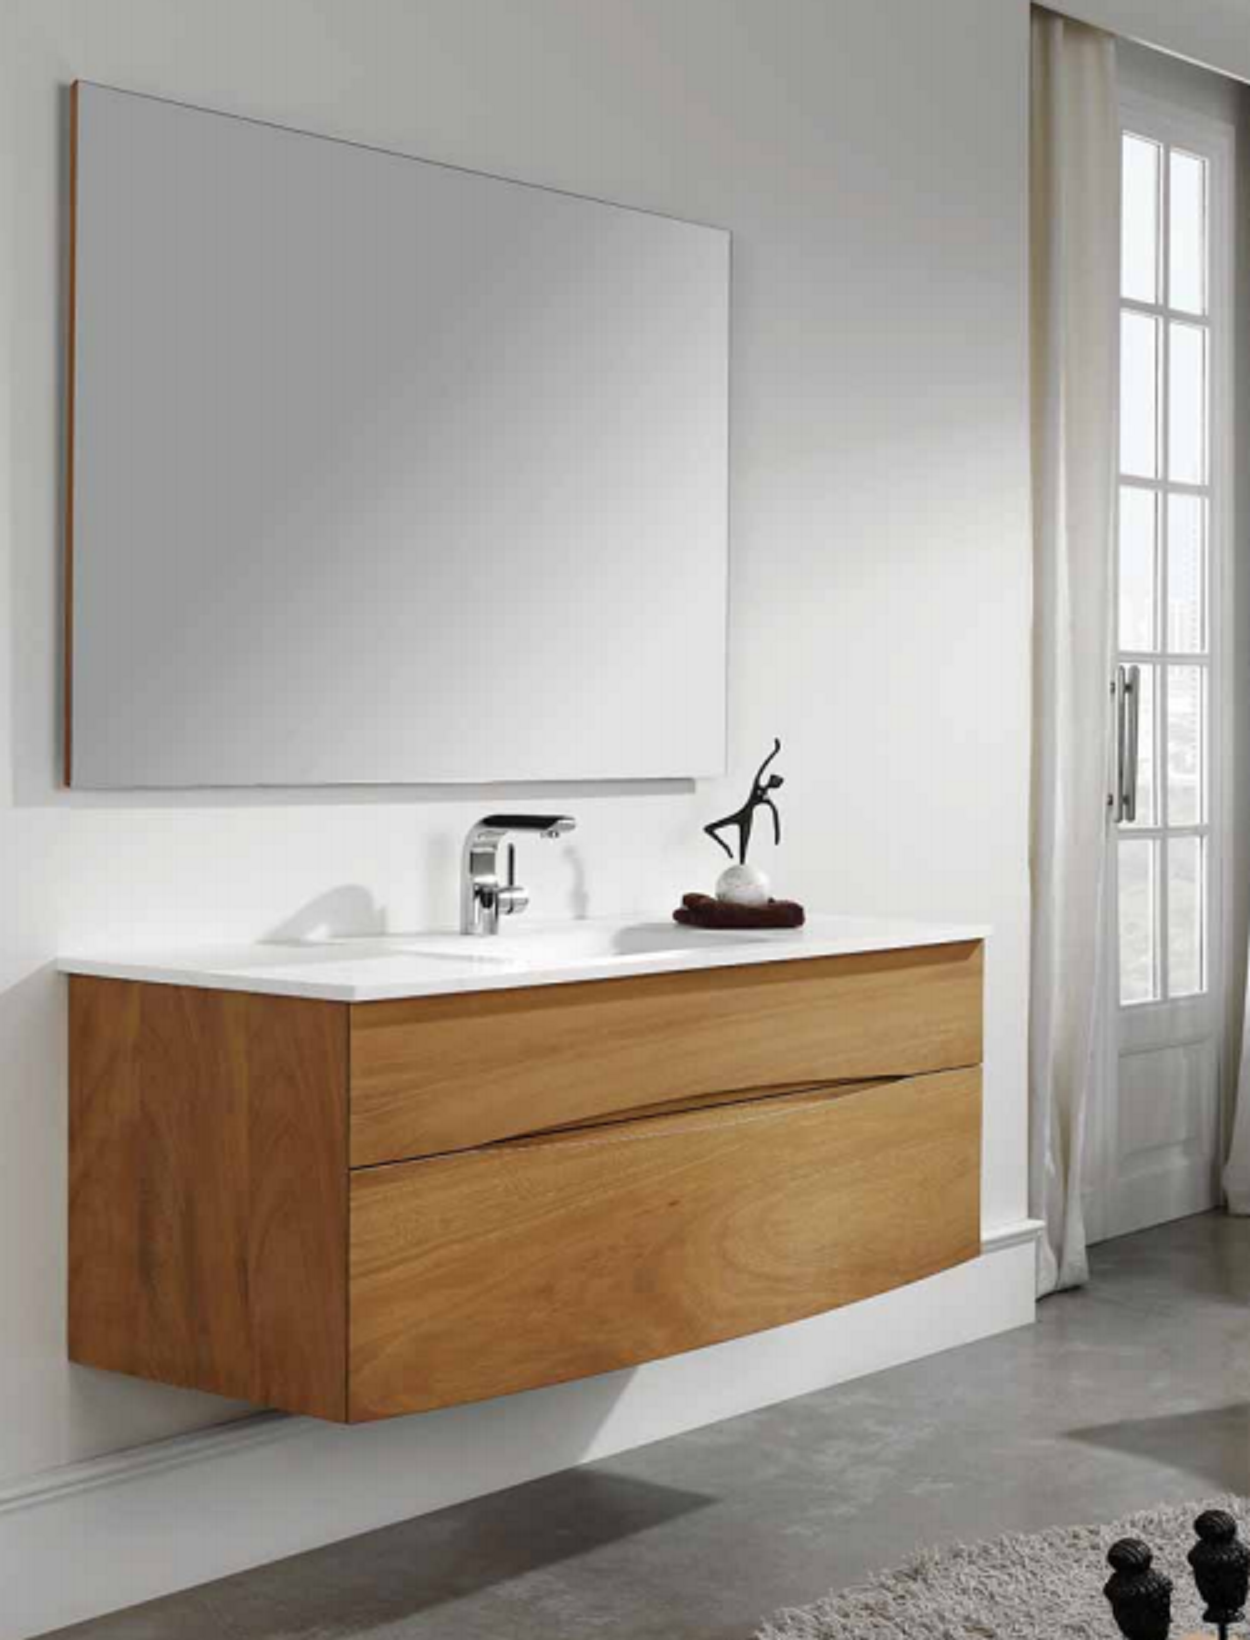 Simple Meuble Salle De Bain Une Vasque